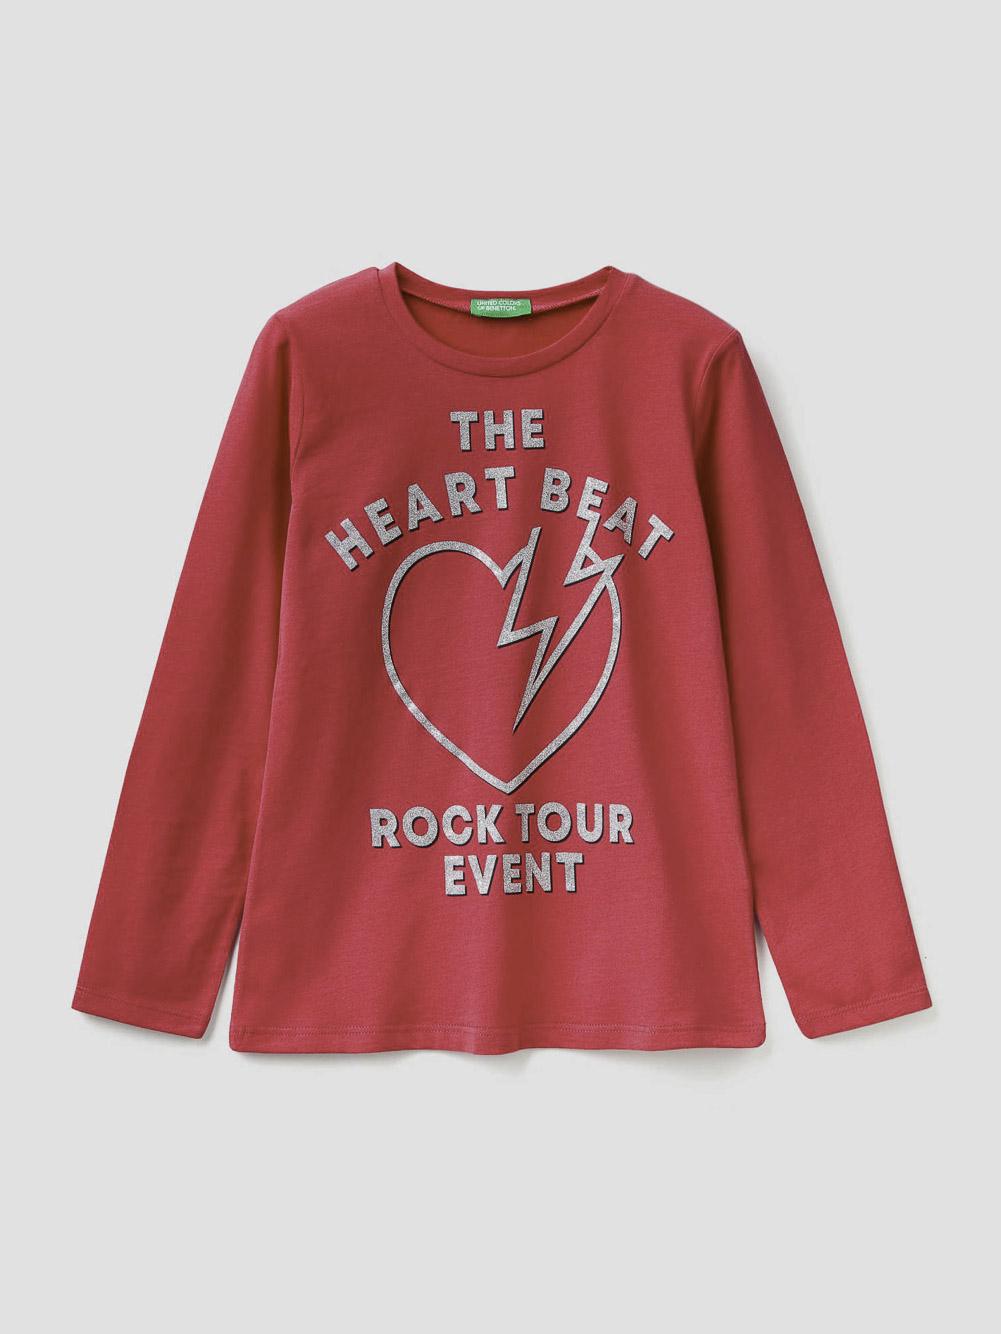 012 BENETTON T-shirt με glitter τύπωμα 3VR5C14Y4 20A143